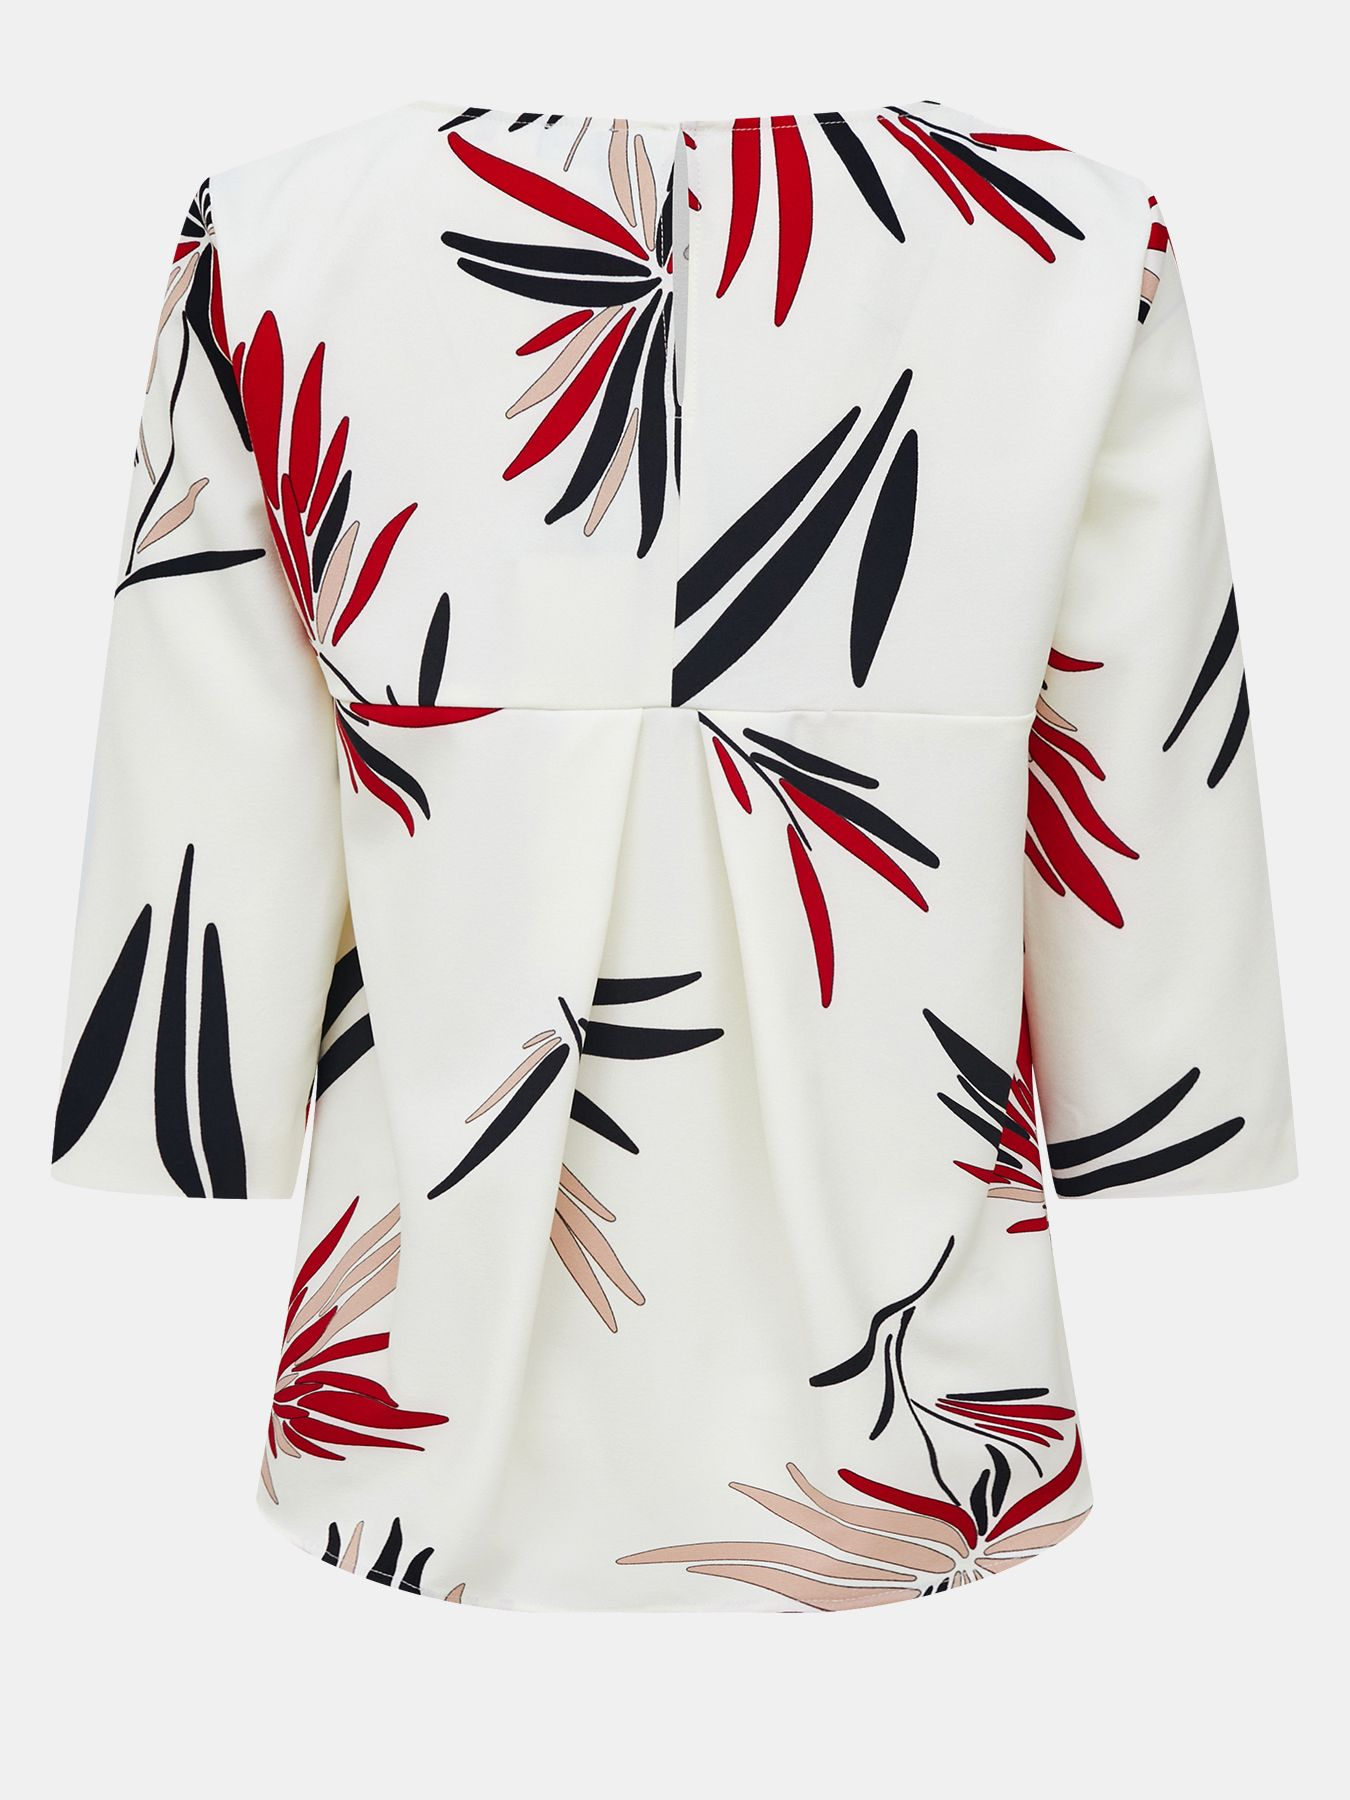 Блузка Emme Marella Блузка Deborah блузка emme marella блузка lisa